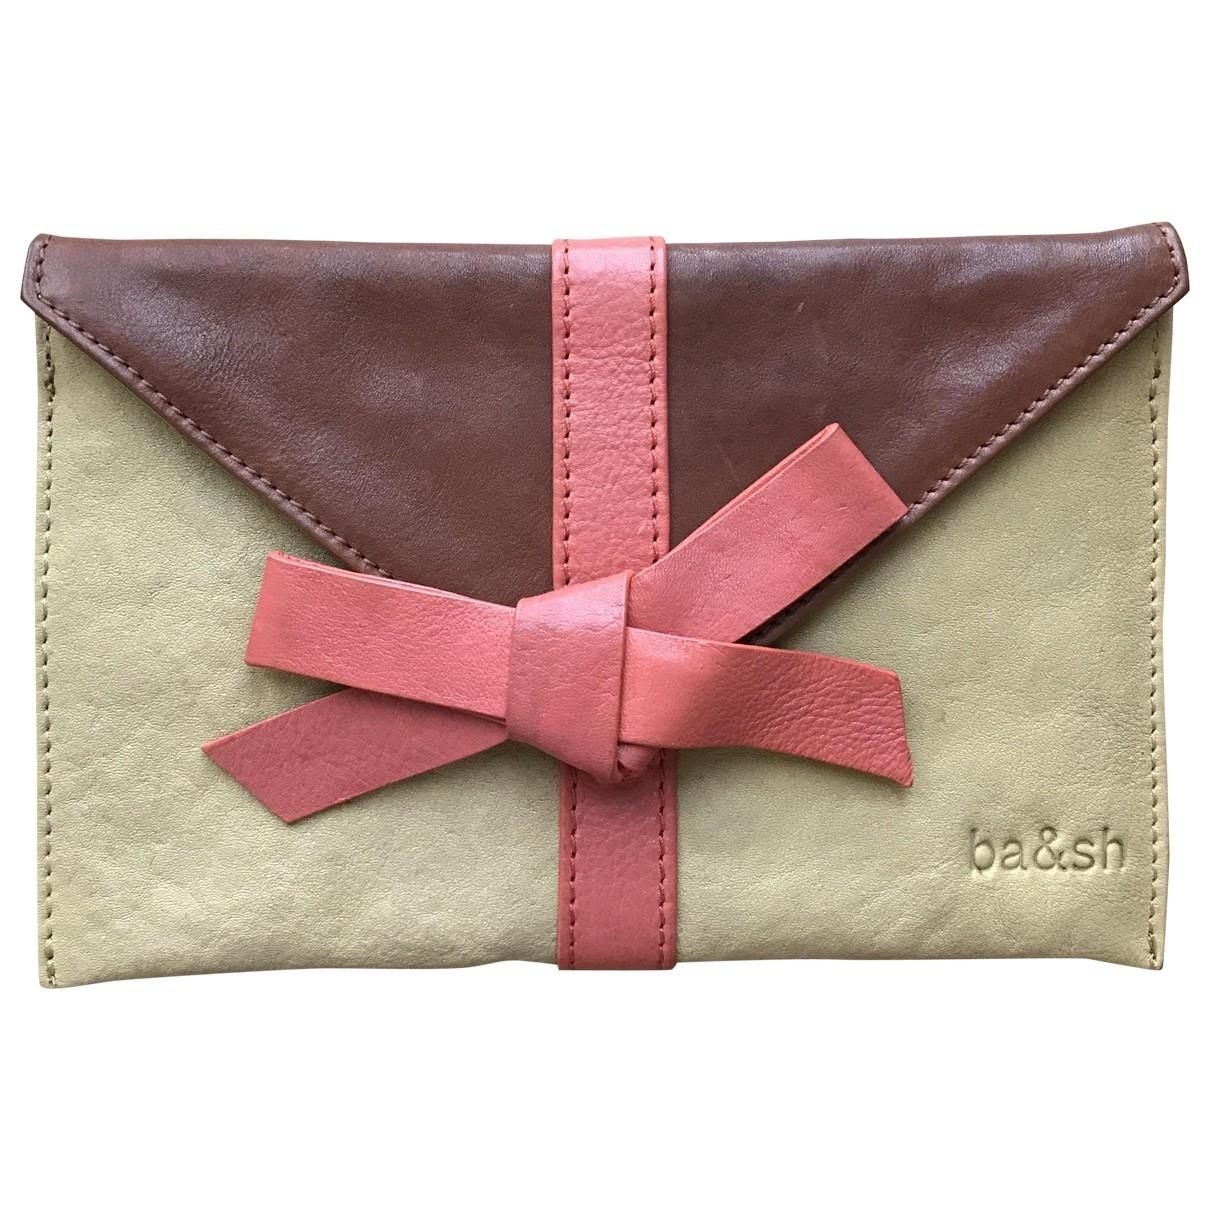 Ba&sh \N Multicolour Leather Clutch bag for Women \N